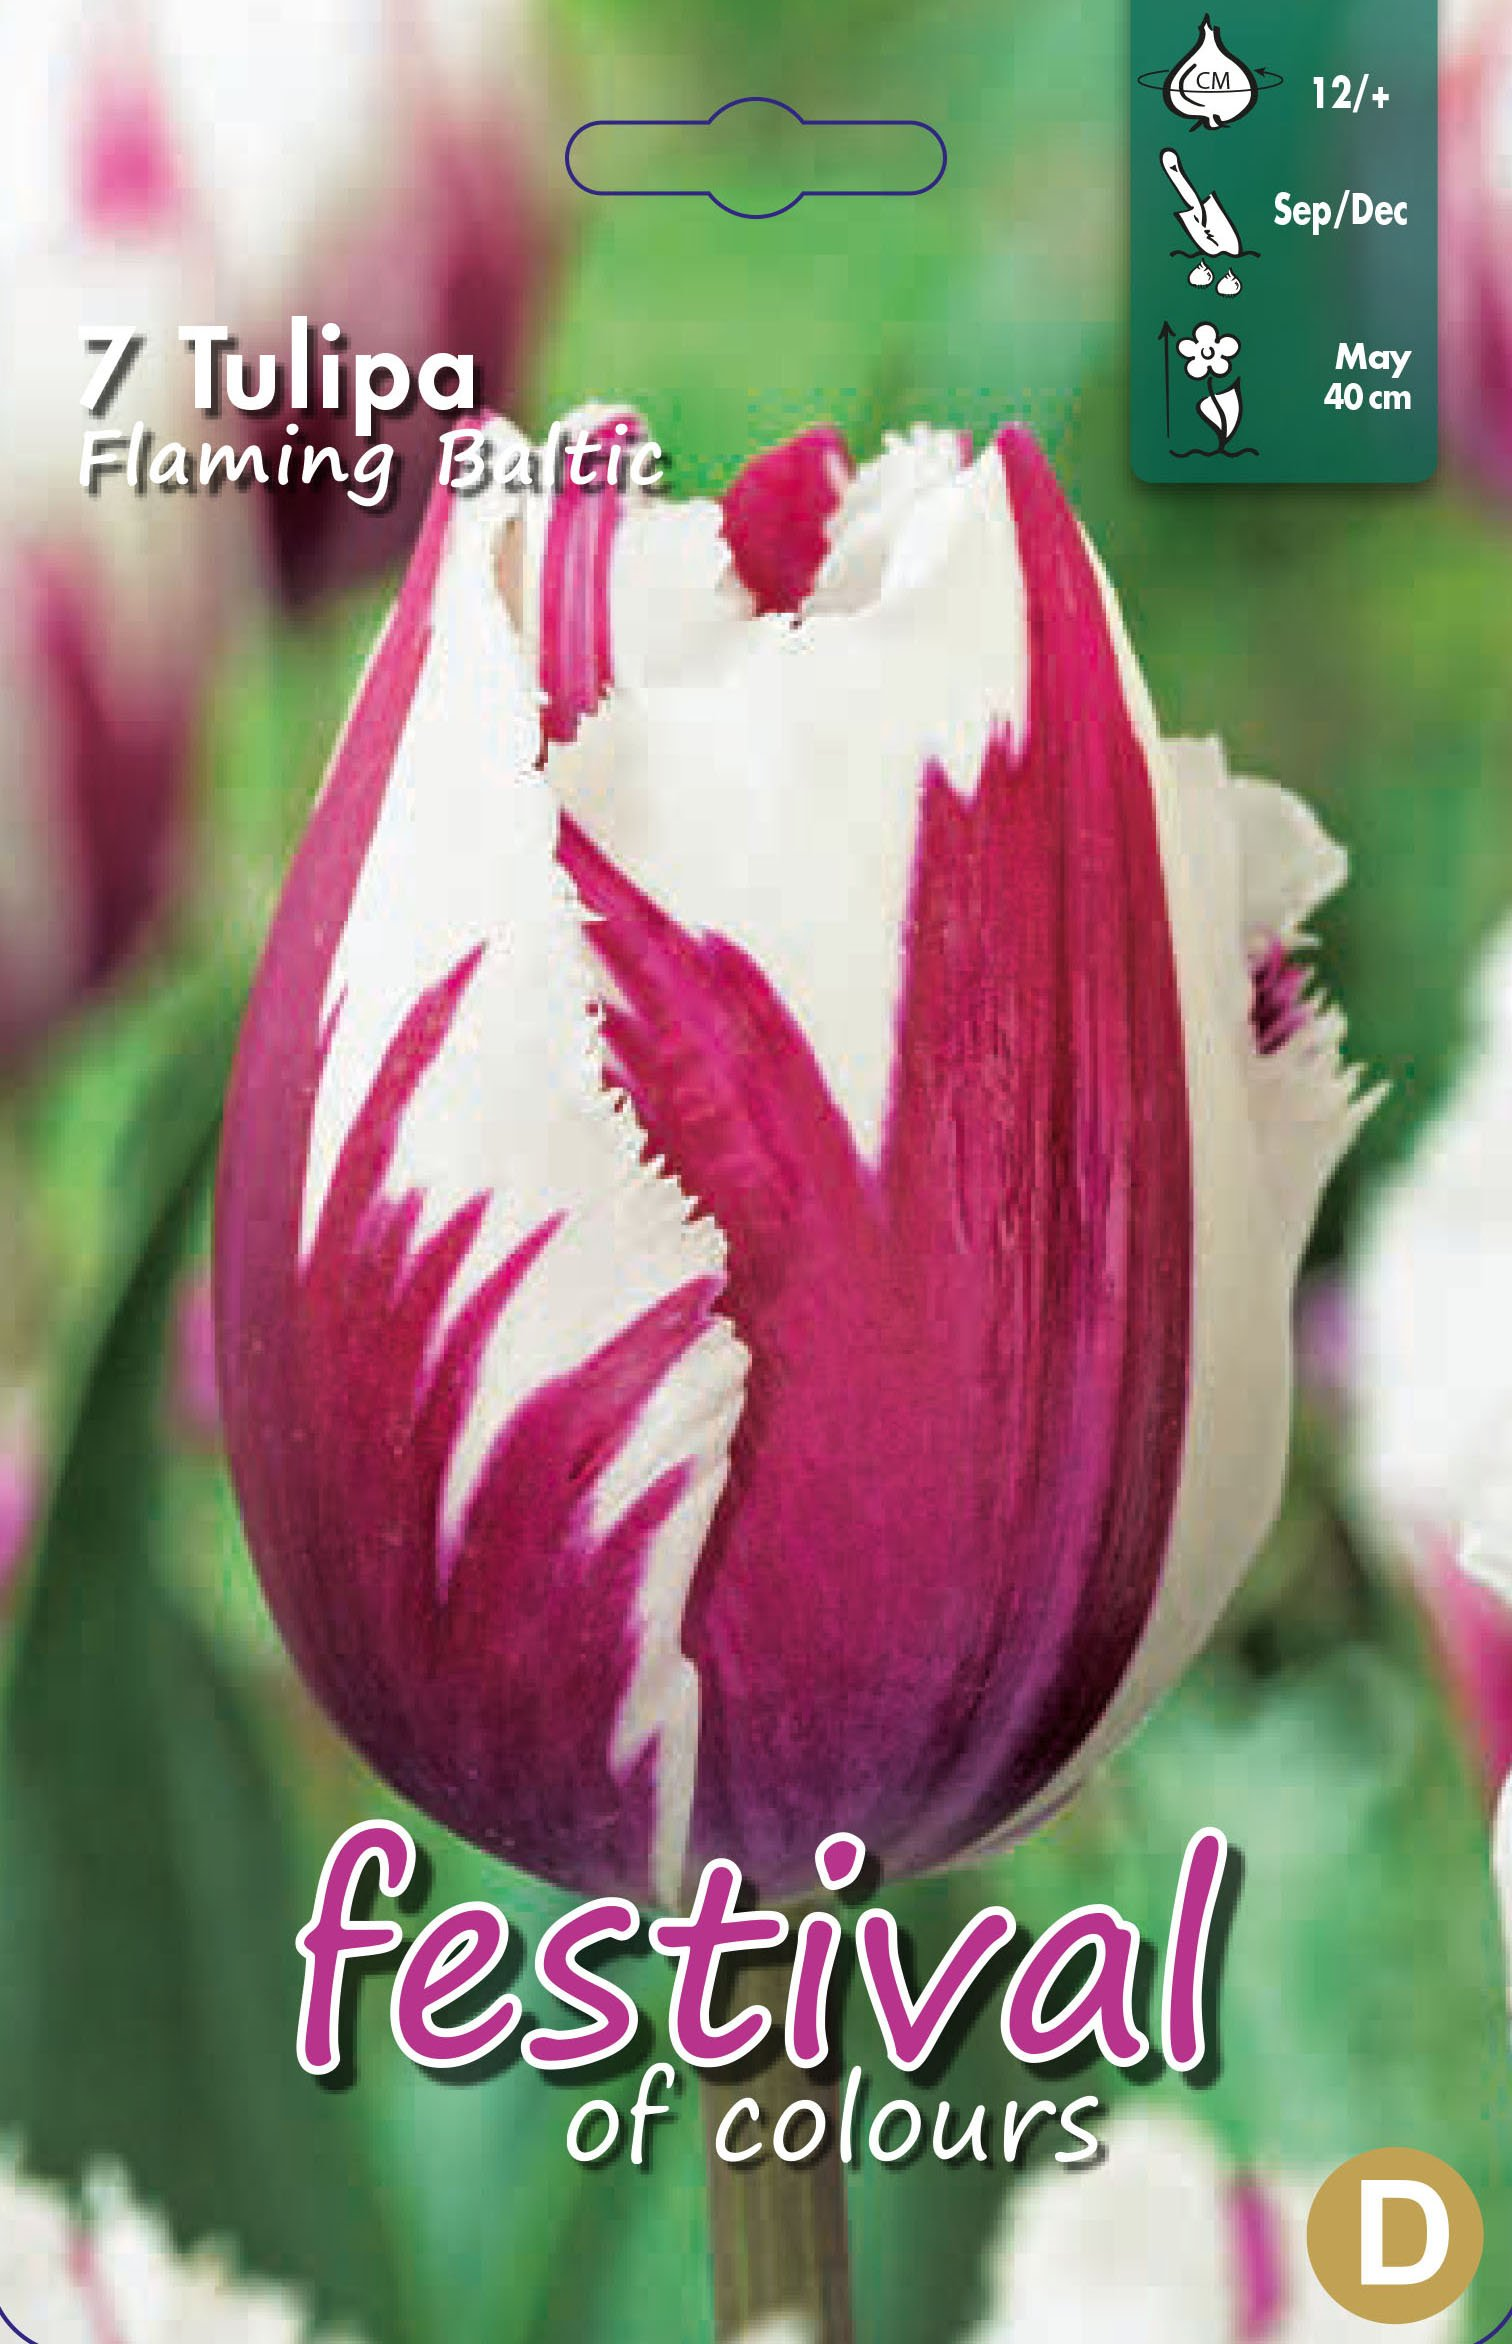 Tulipa Flaming Baltic 7 stk